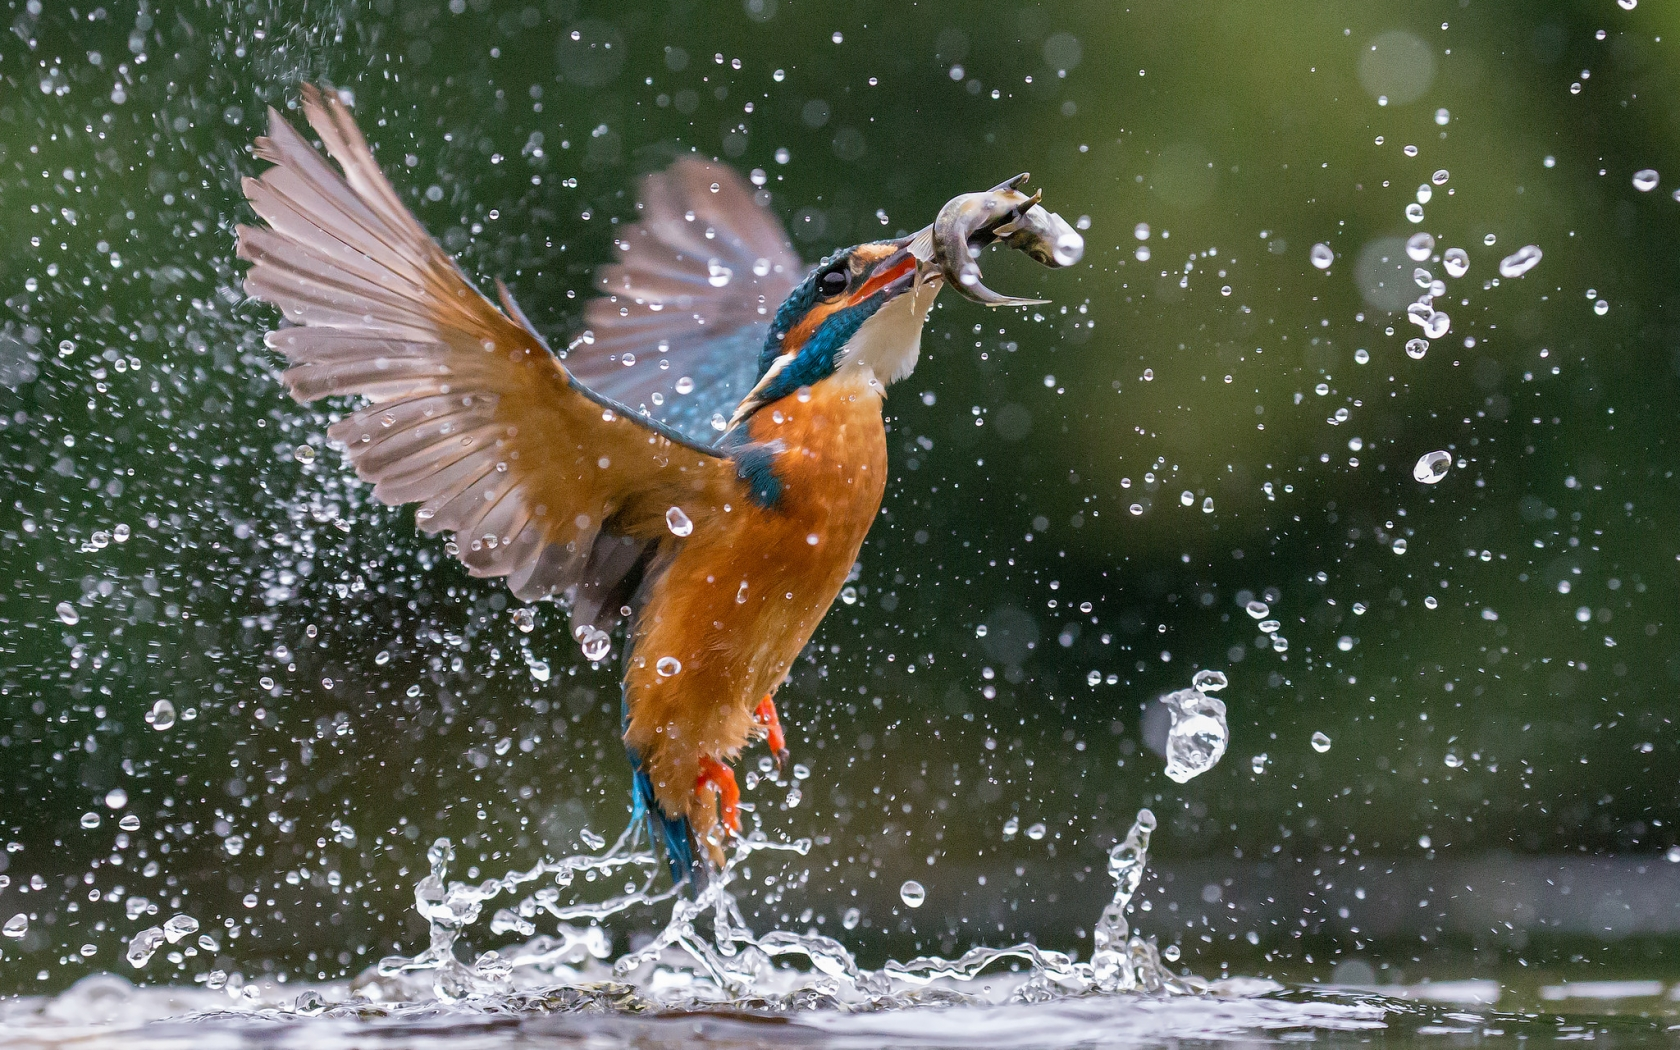 Pajaro cazando peces - 1680x1050